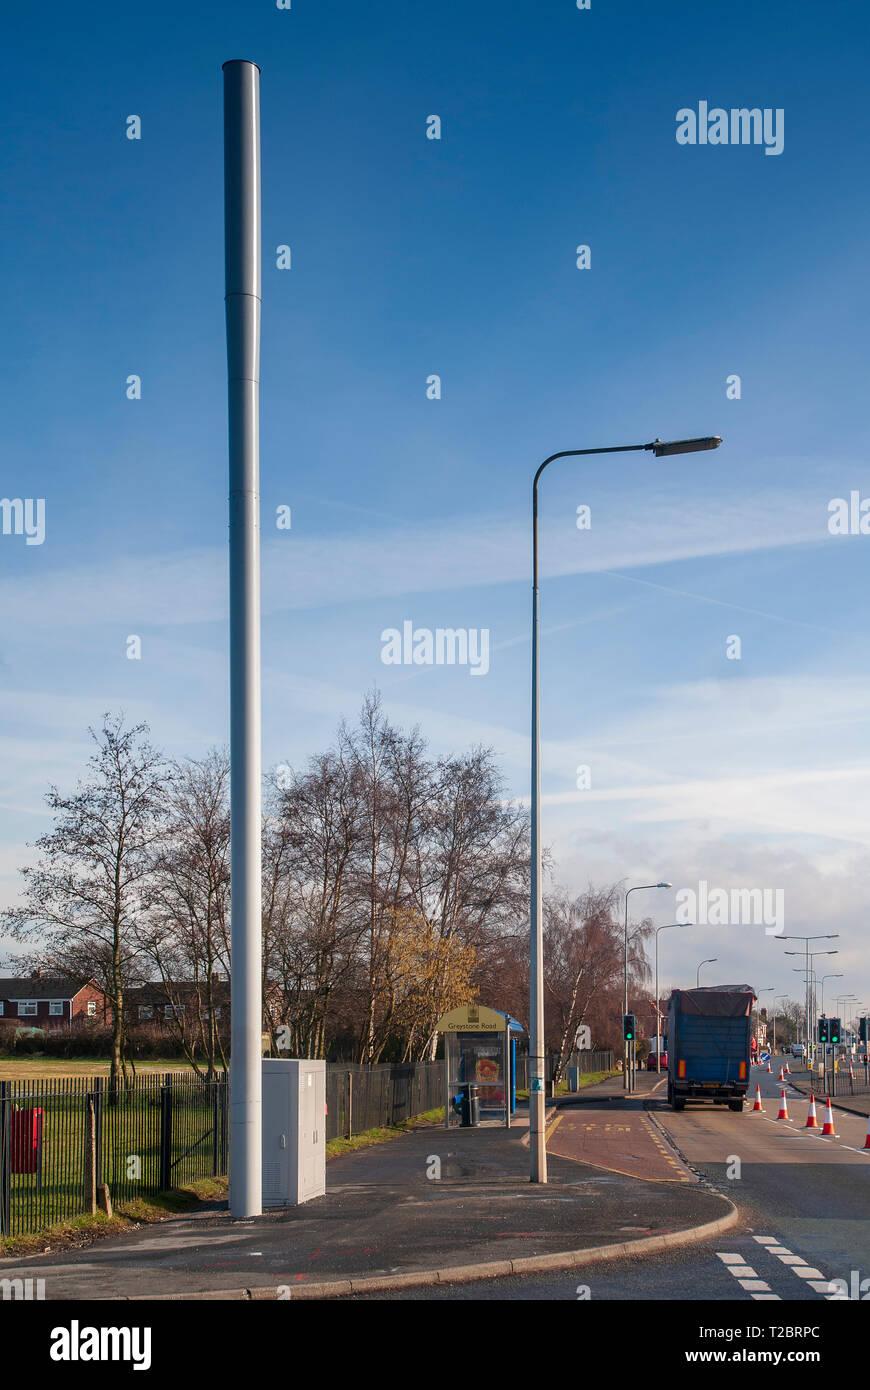 Cellular phone street equipment. - Stock Image